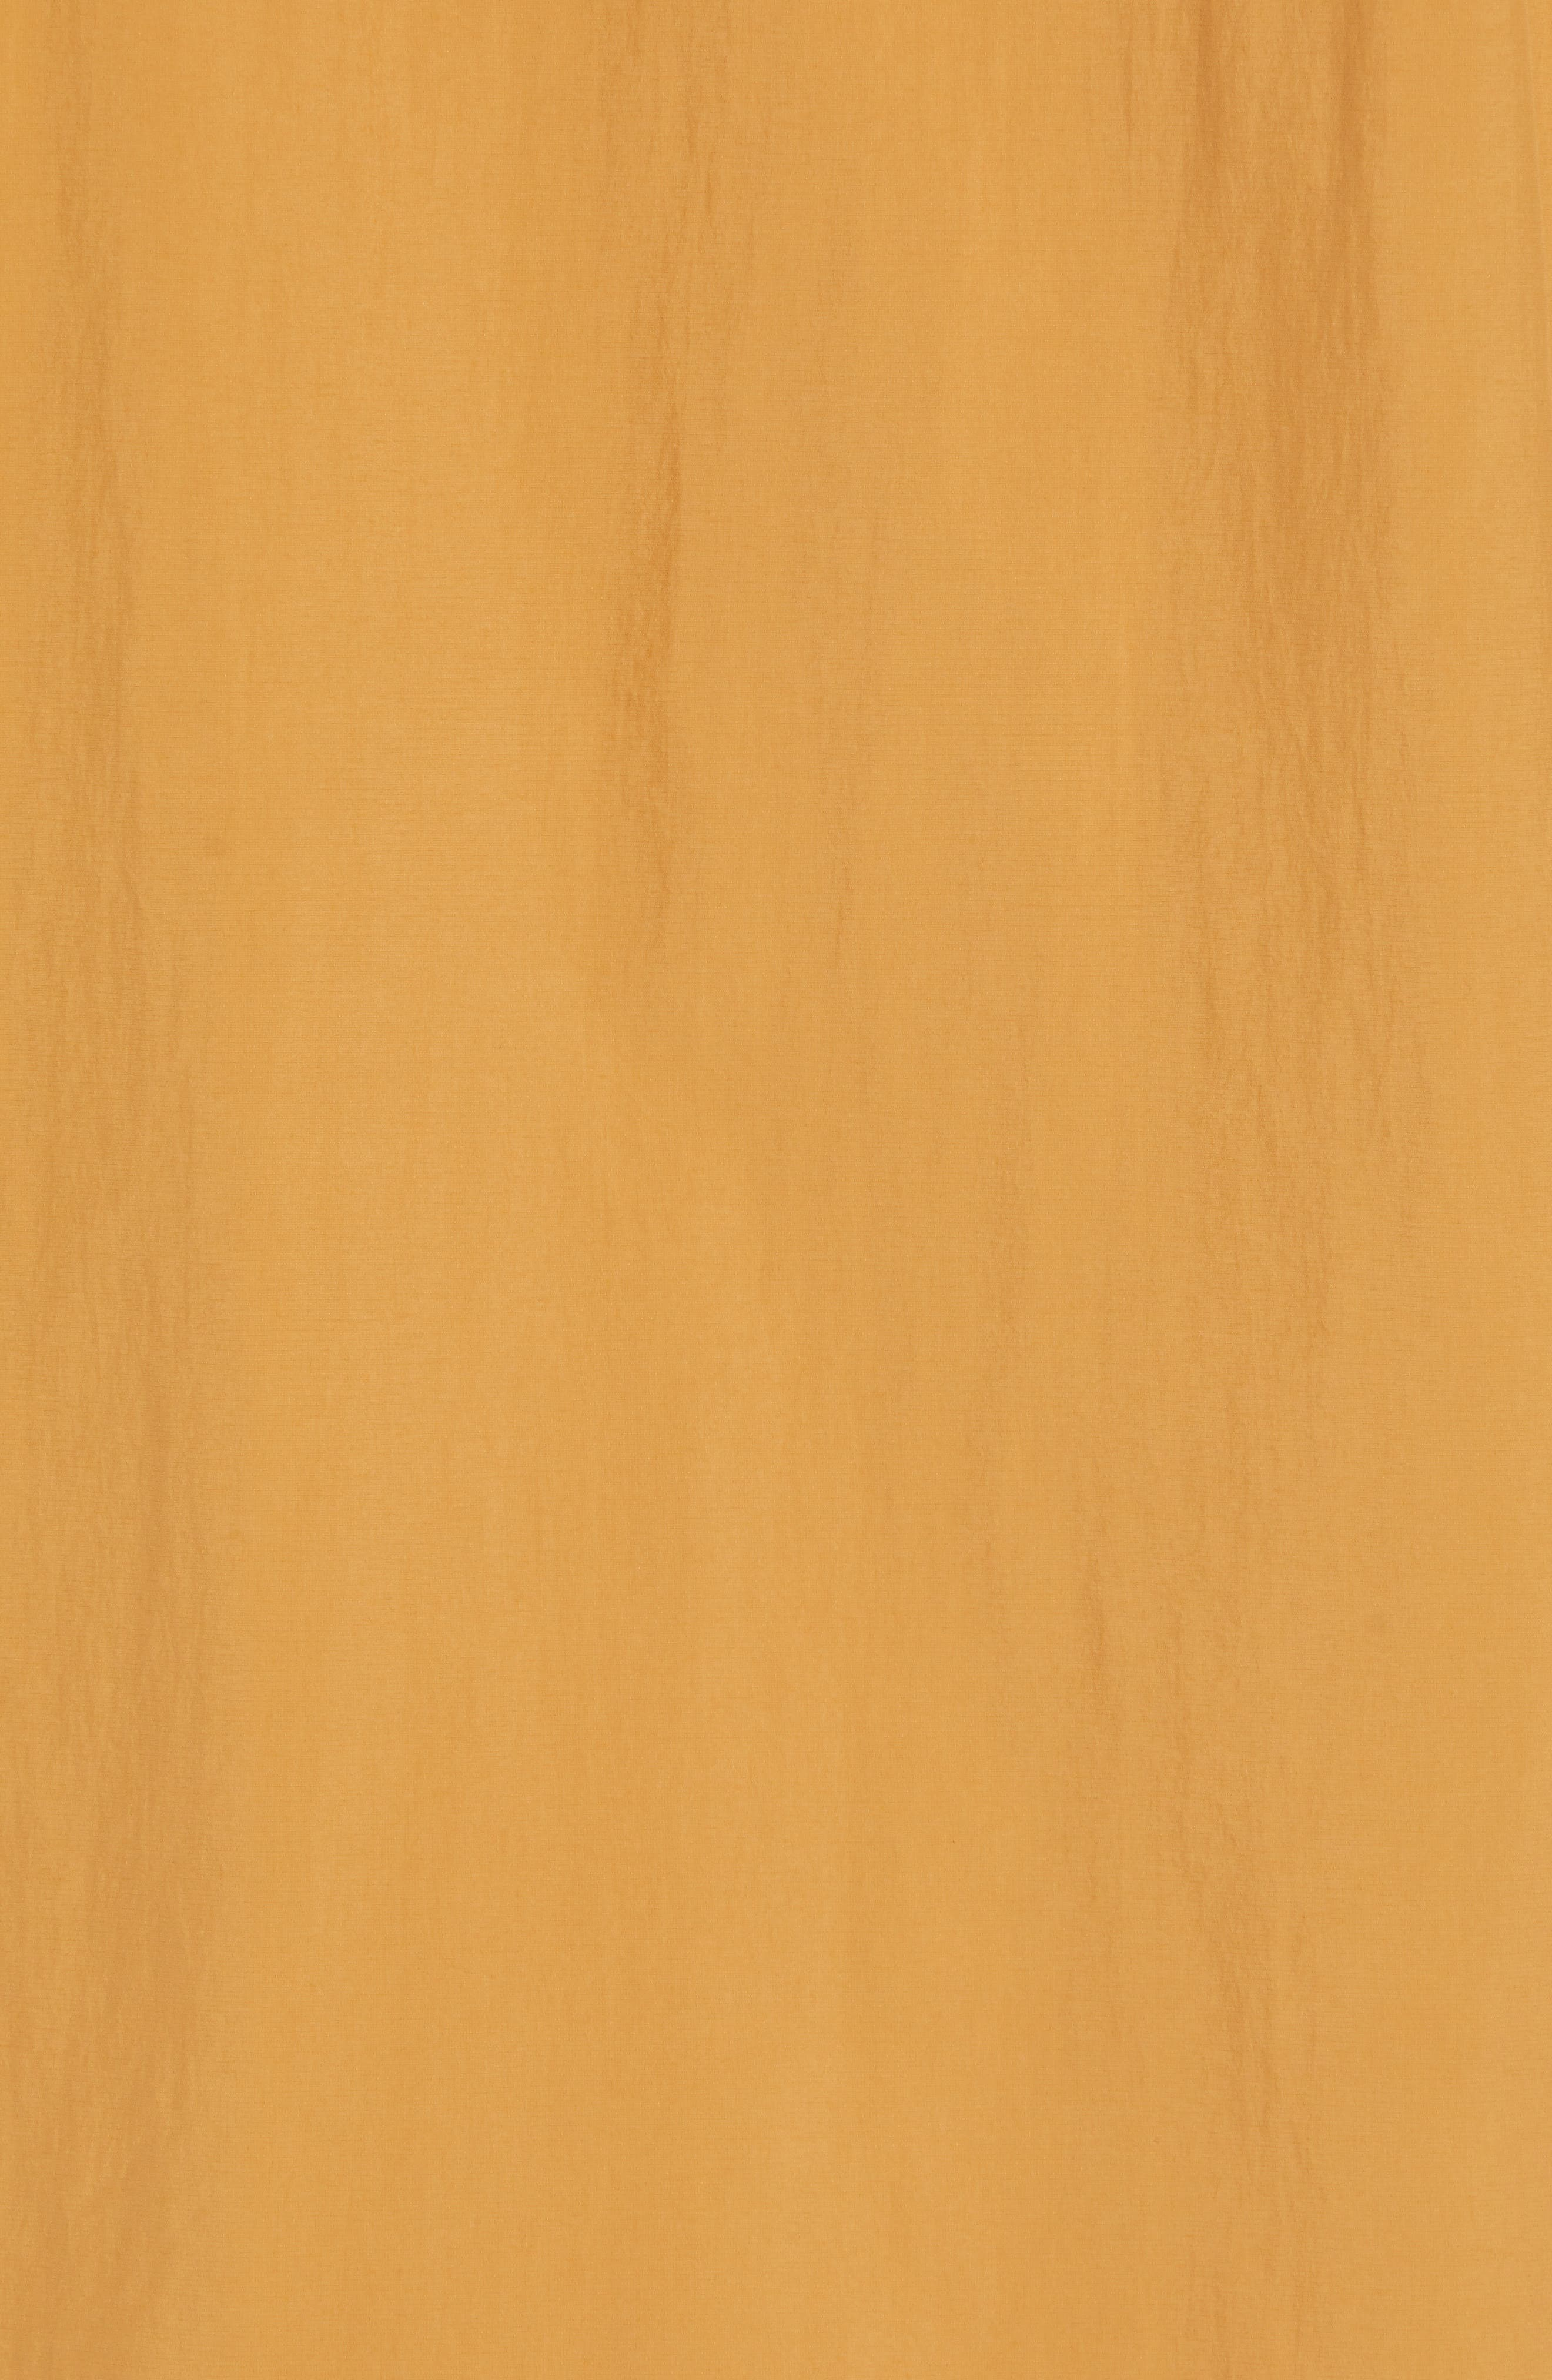 Windbreaker Hooded Jacket,                             Alternate thumbnail 7, color,                             WHEAT BOOT/ BLACK